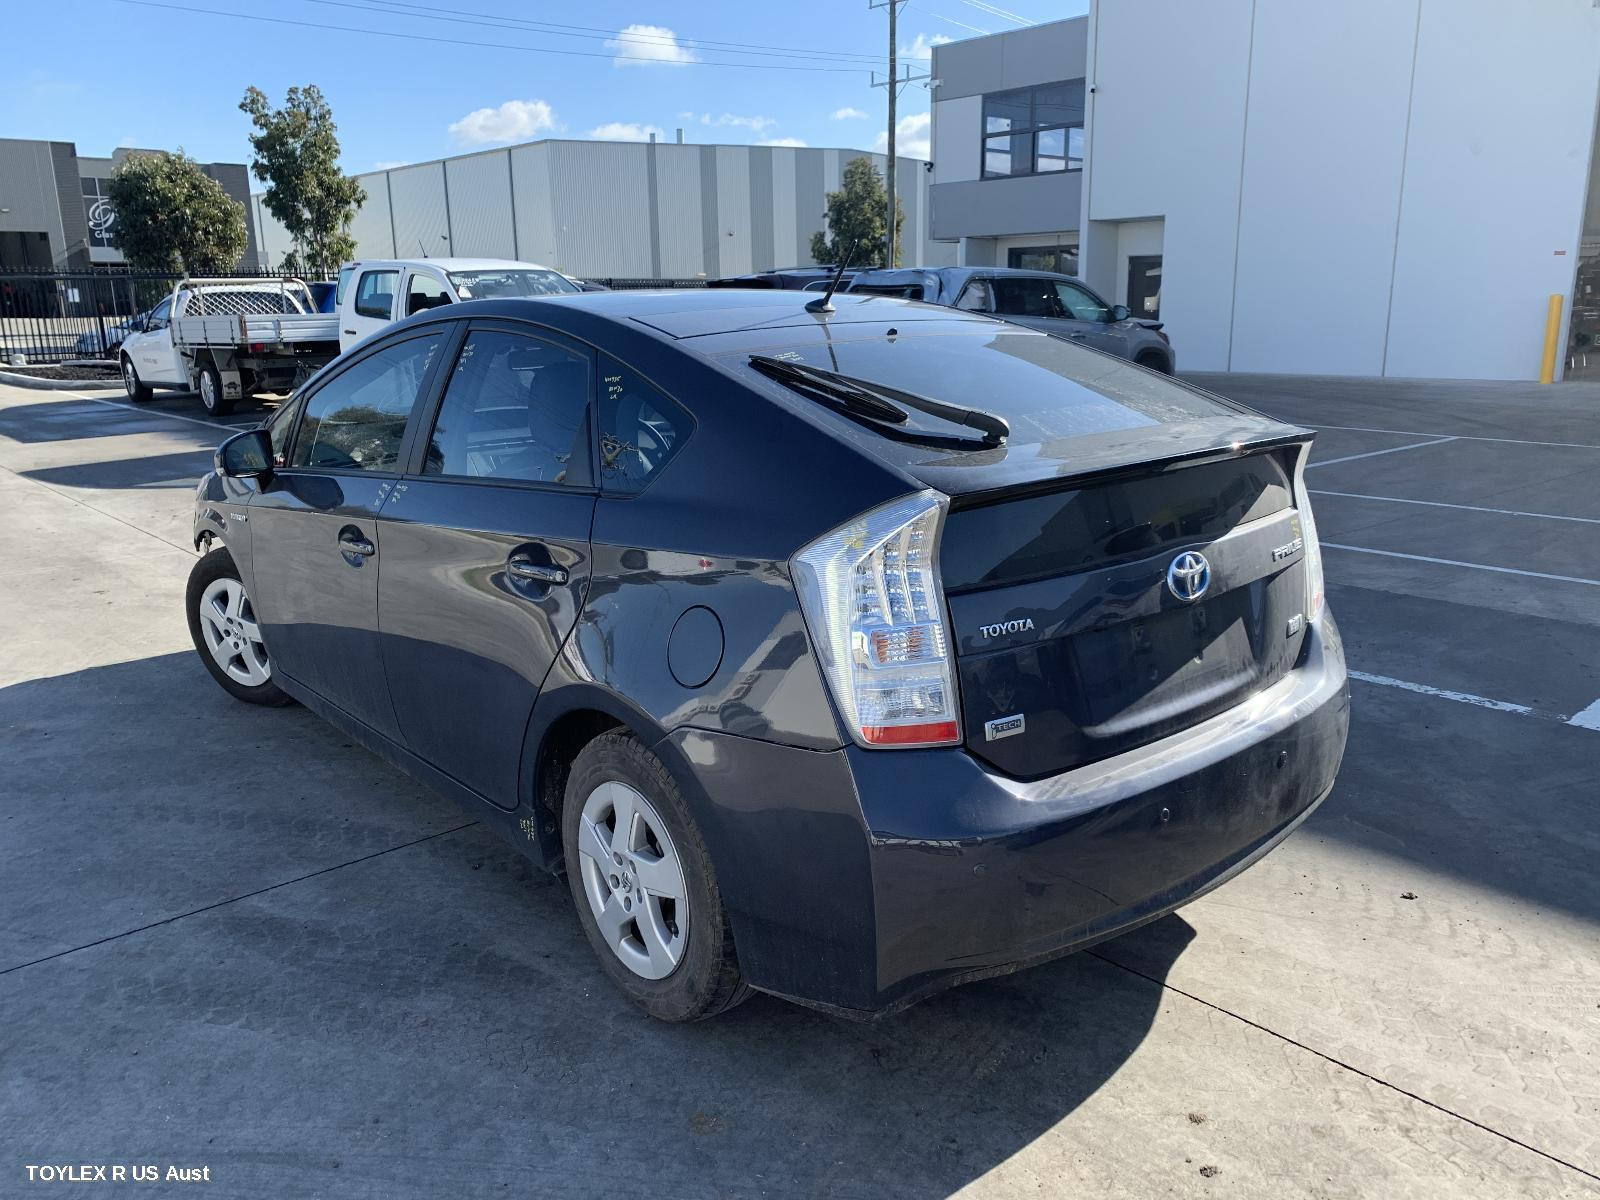 Toyota Prius ZVW30R I-TECH 2ZR-FXE 1.8L Engine Automatic FWD Transmission 07/09 - 12/15